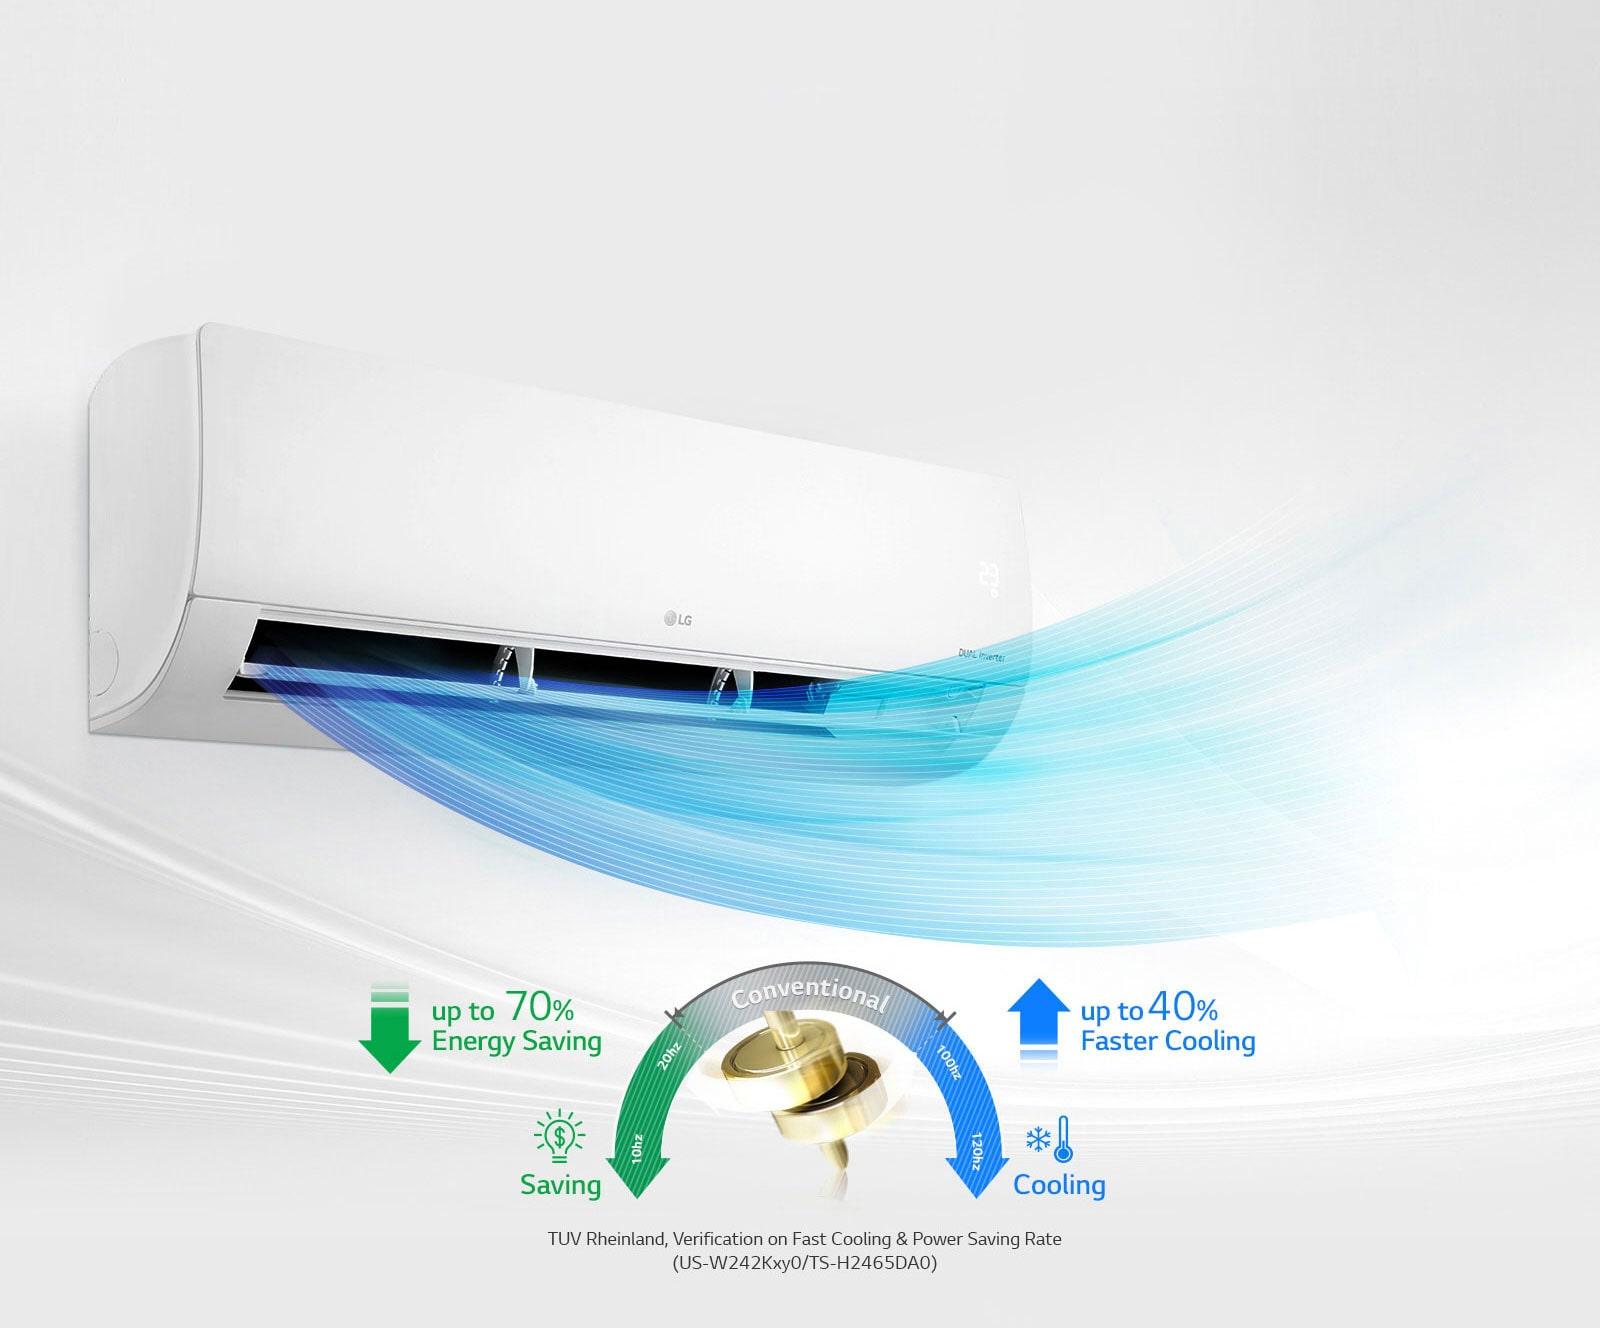 S4-Q12JA3QG_03_Fast_Cooling_&_Energy_Saving_14032019_D